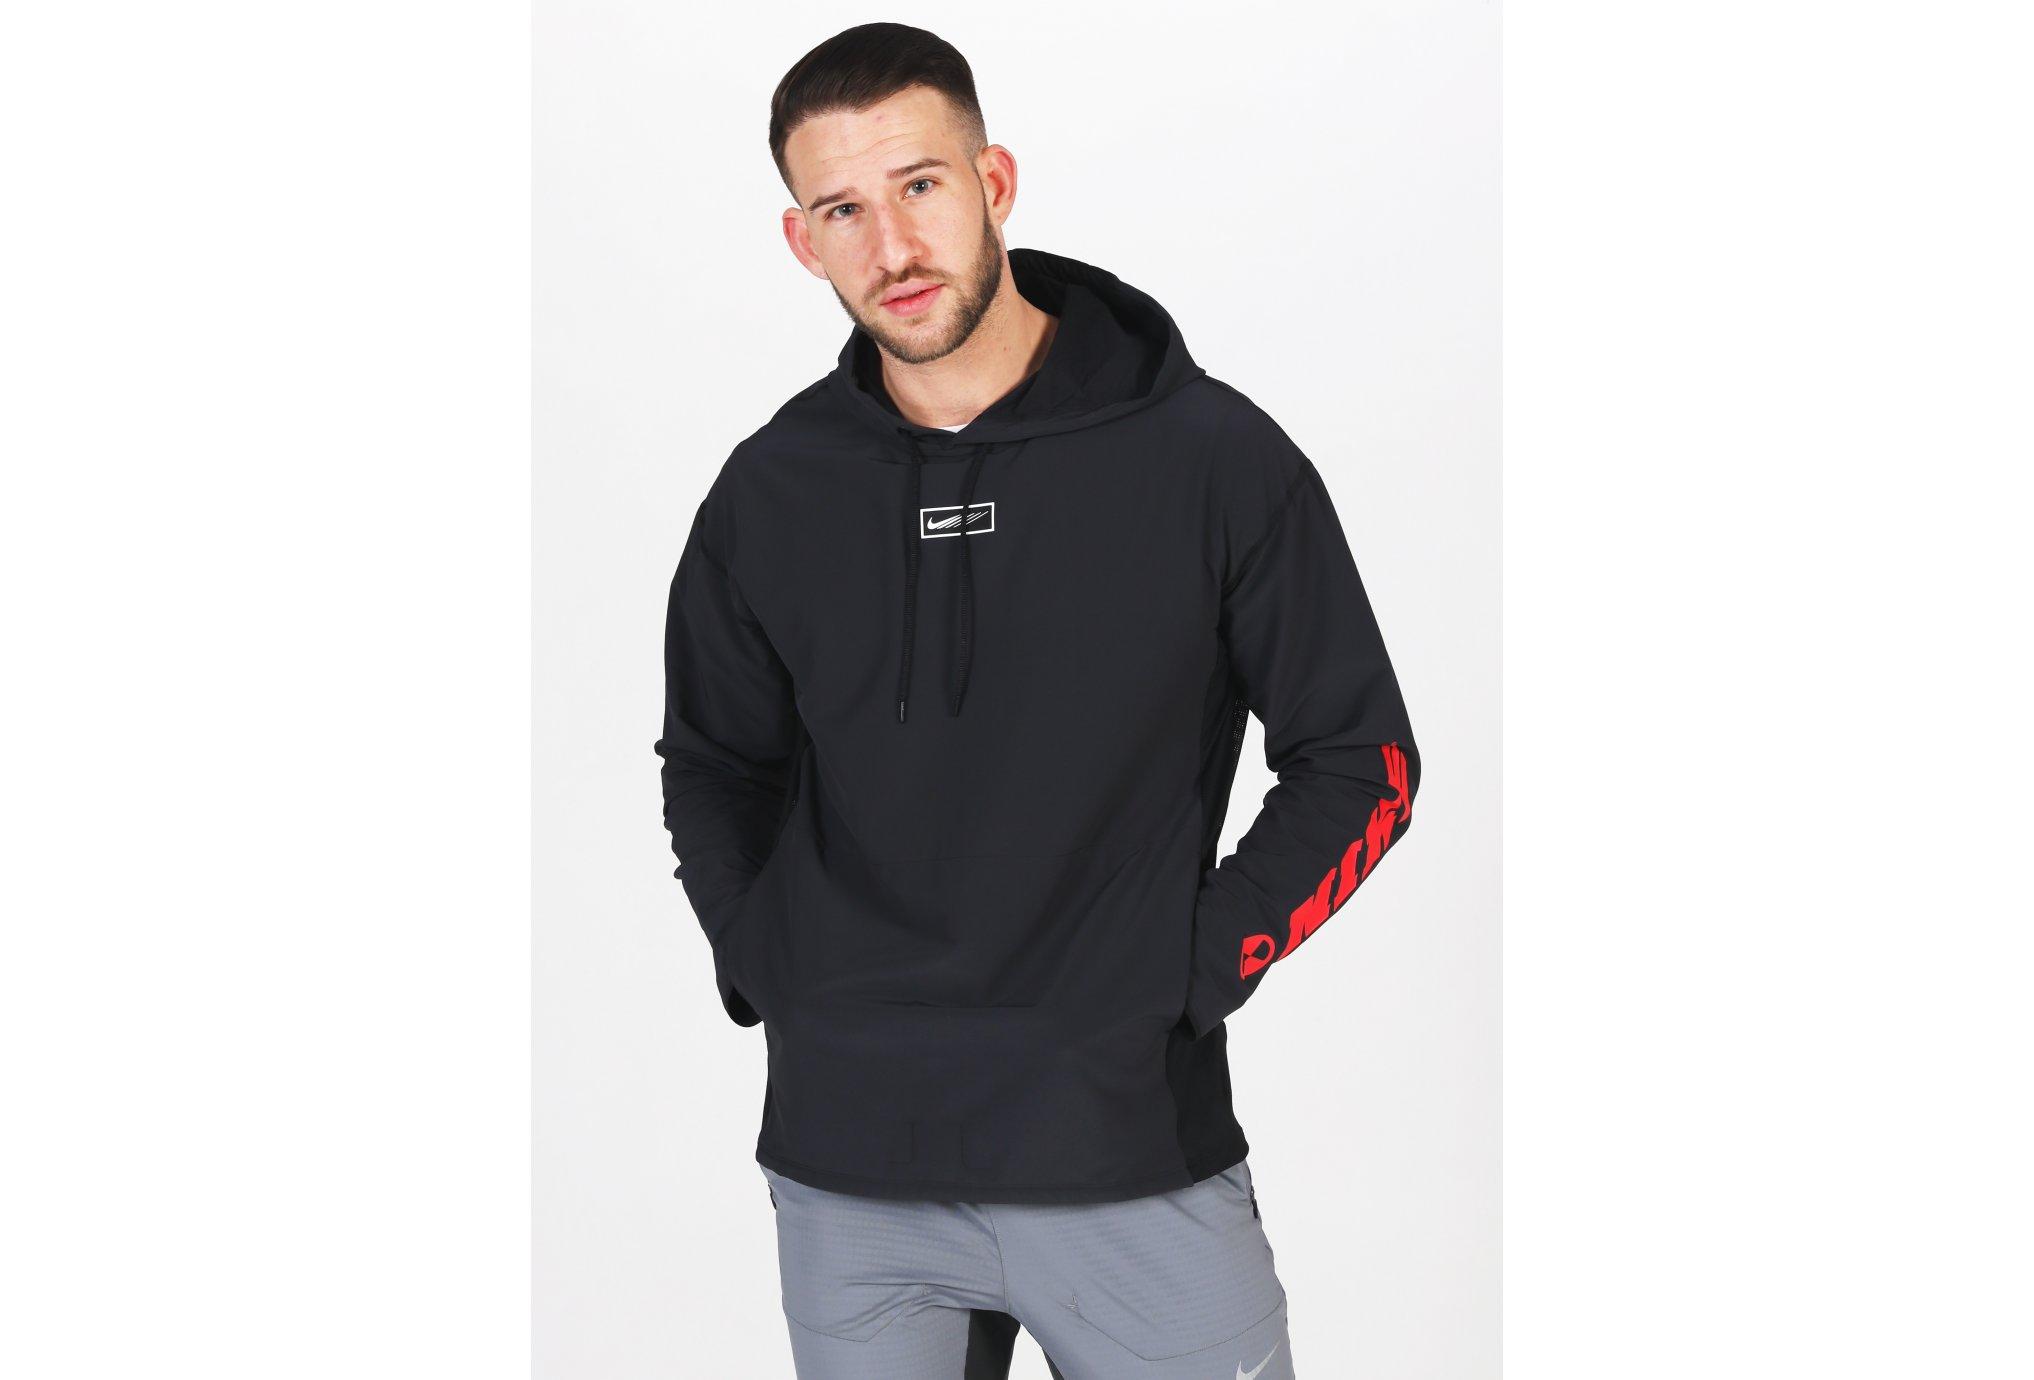 Nike Woven M vêtement running homme